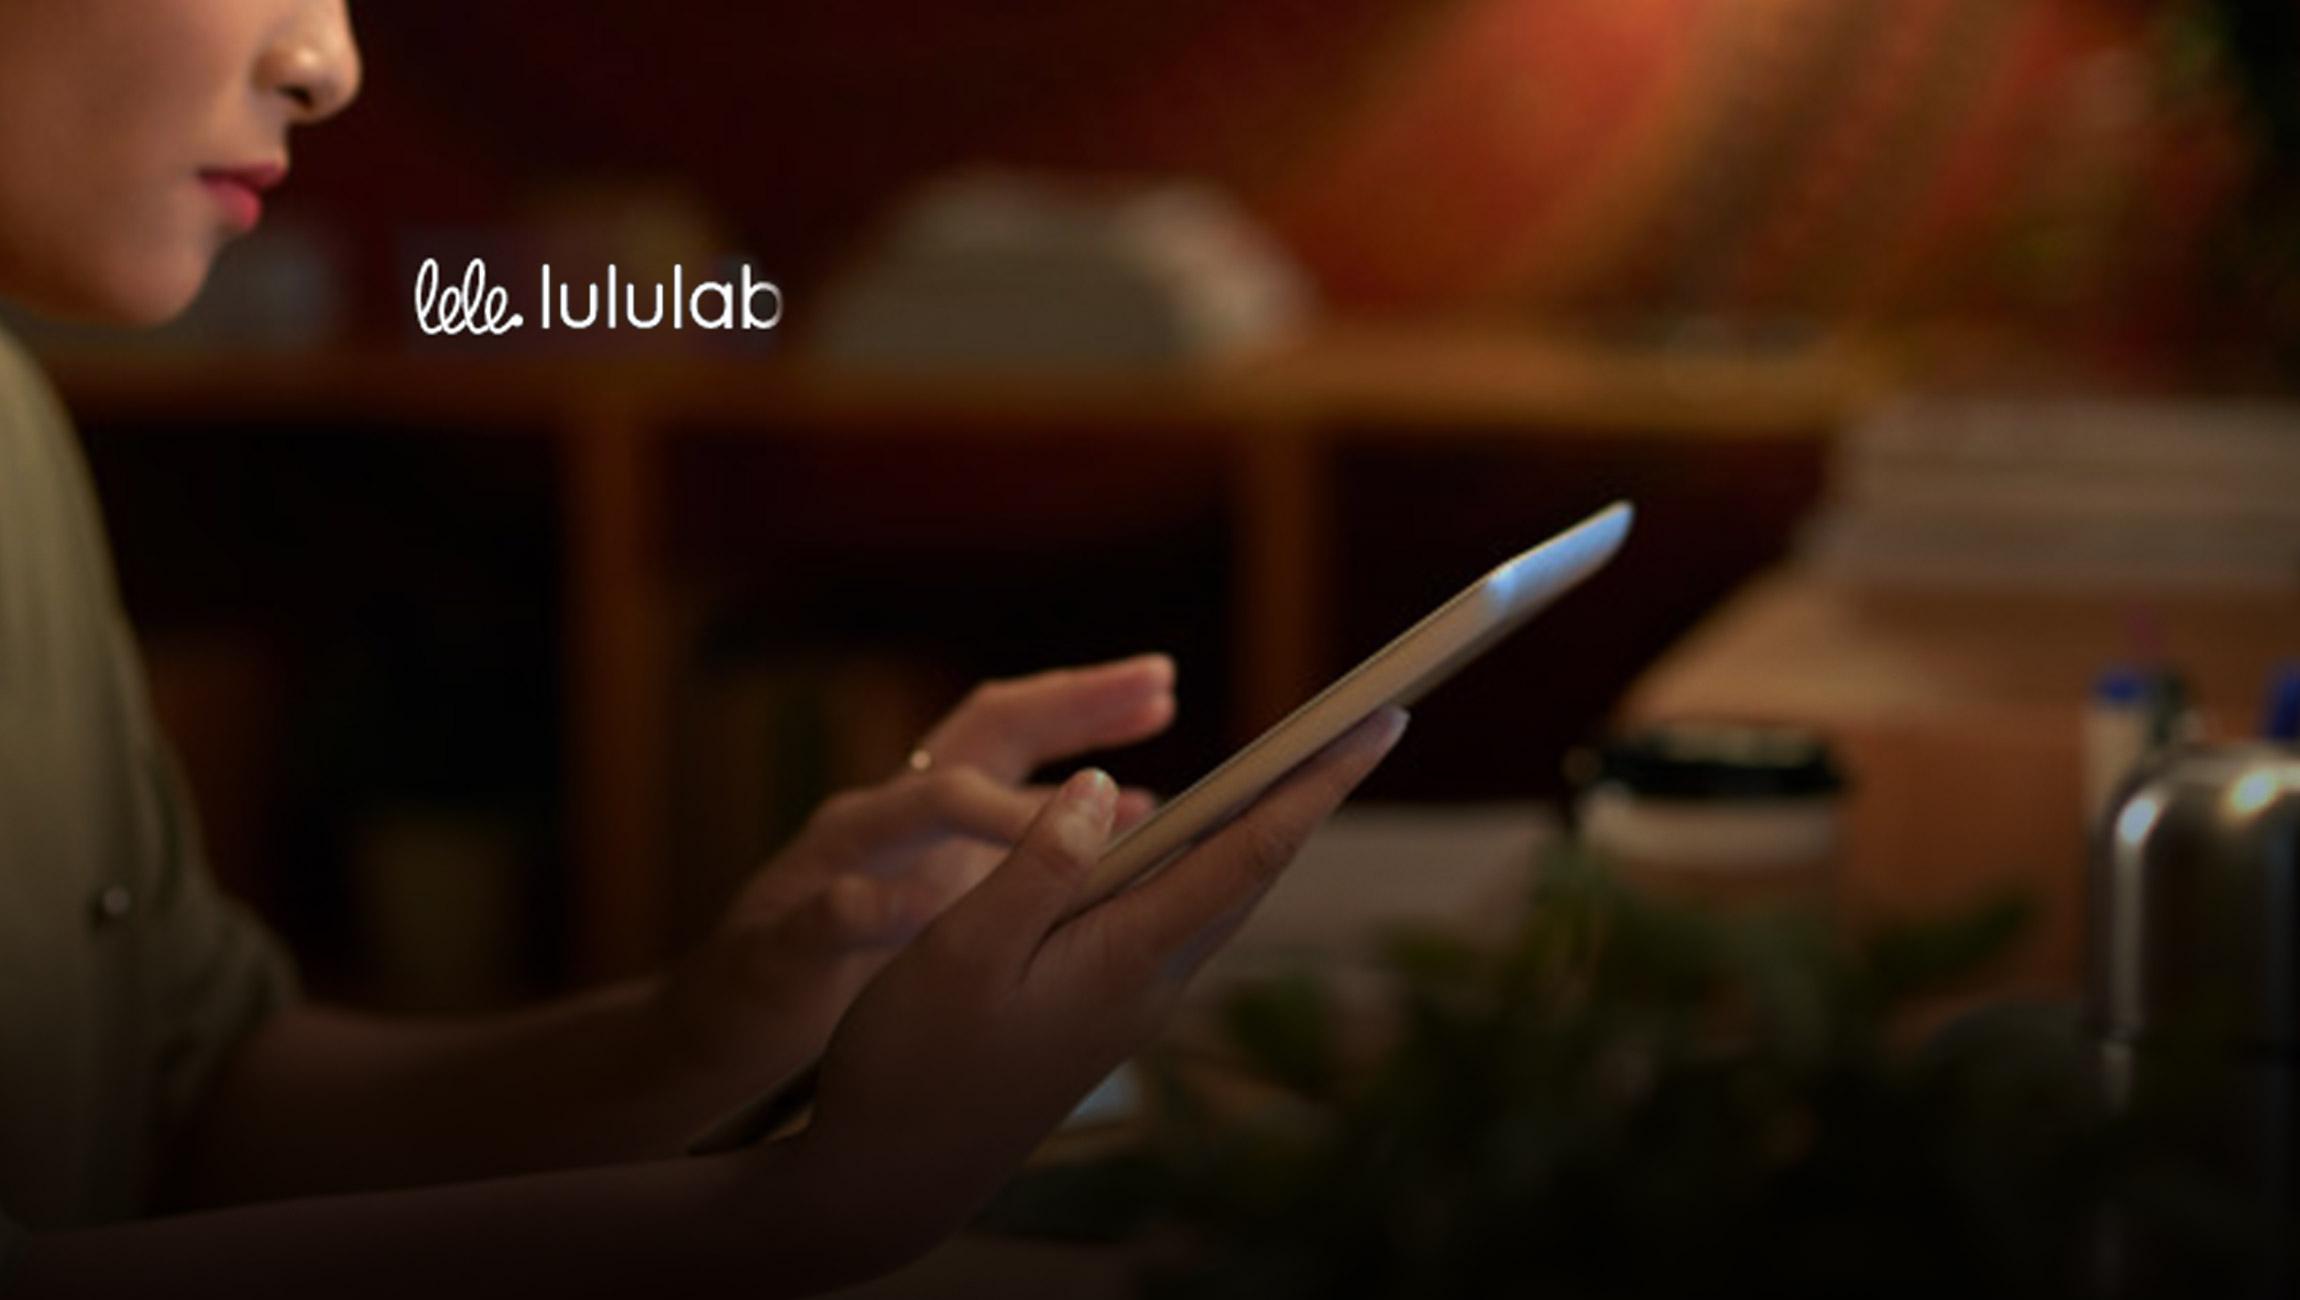 lululab-secures-Series-B-funding-led-by-Netmarble